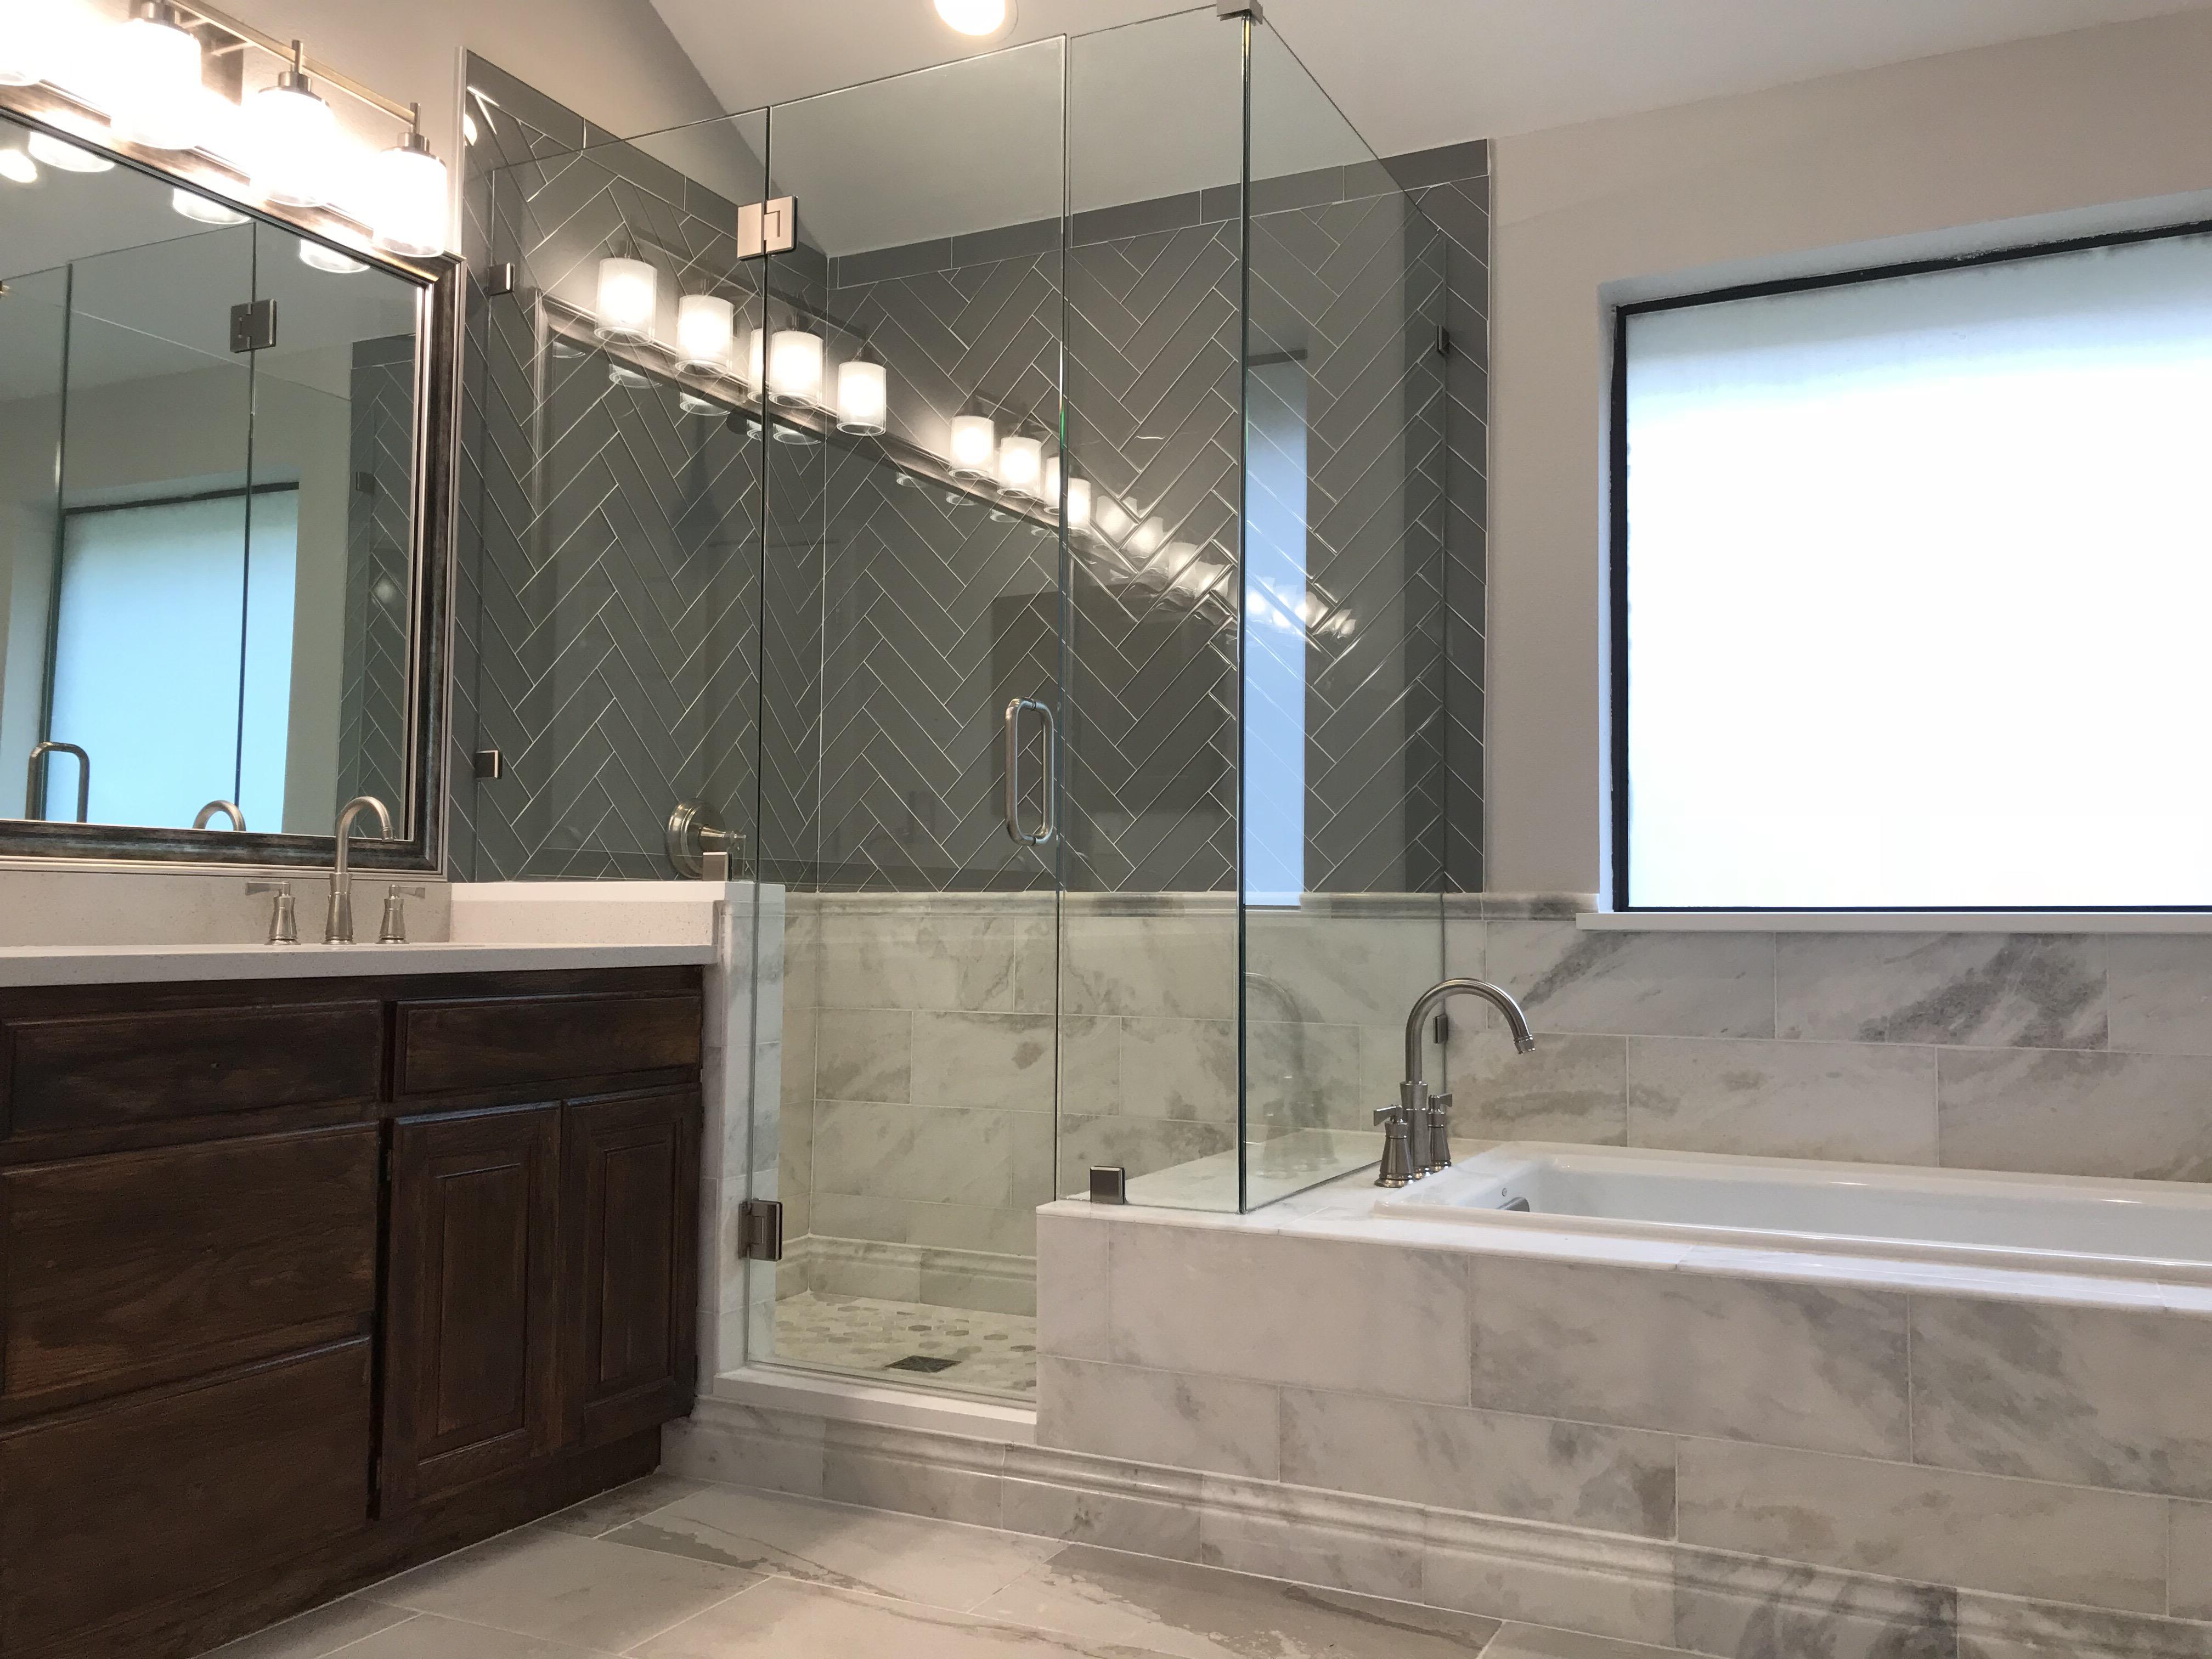 Master bathroom remodeler - Plano, TX